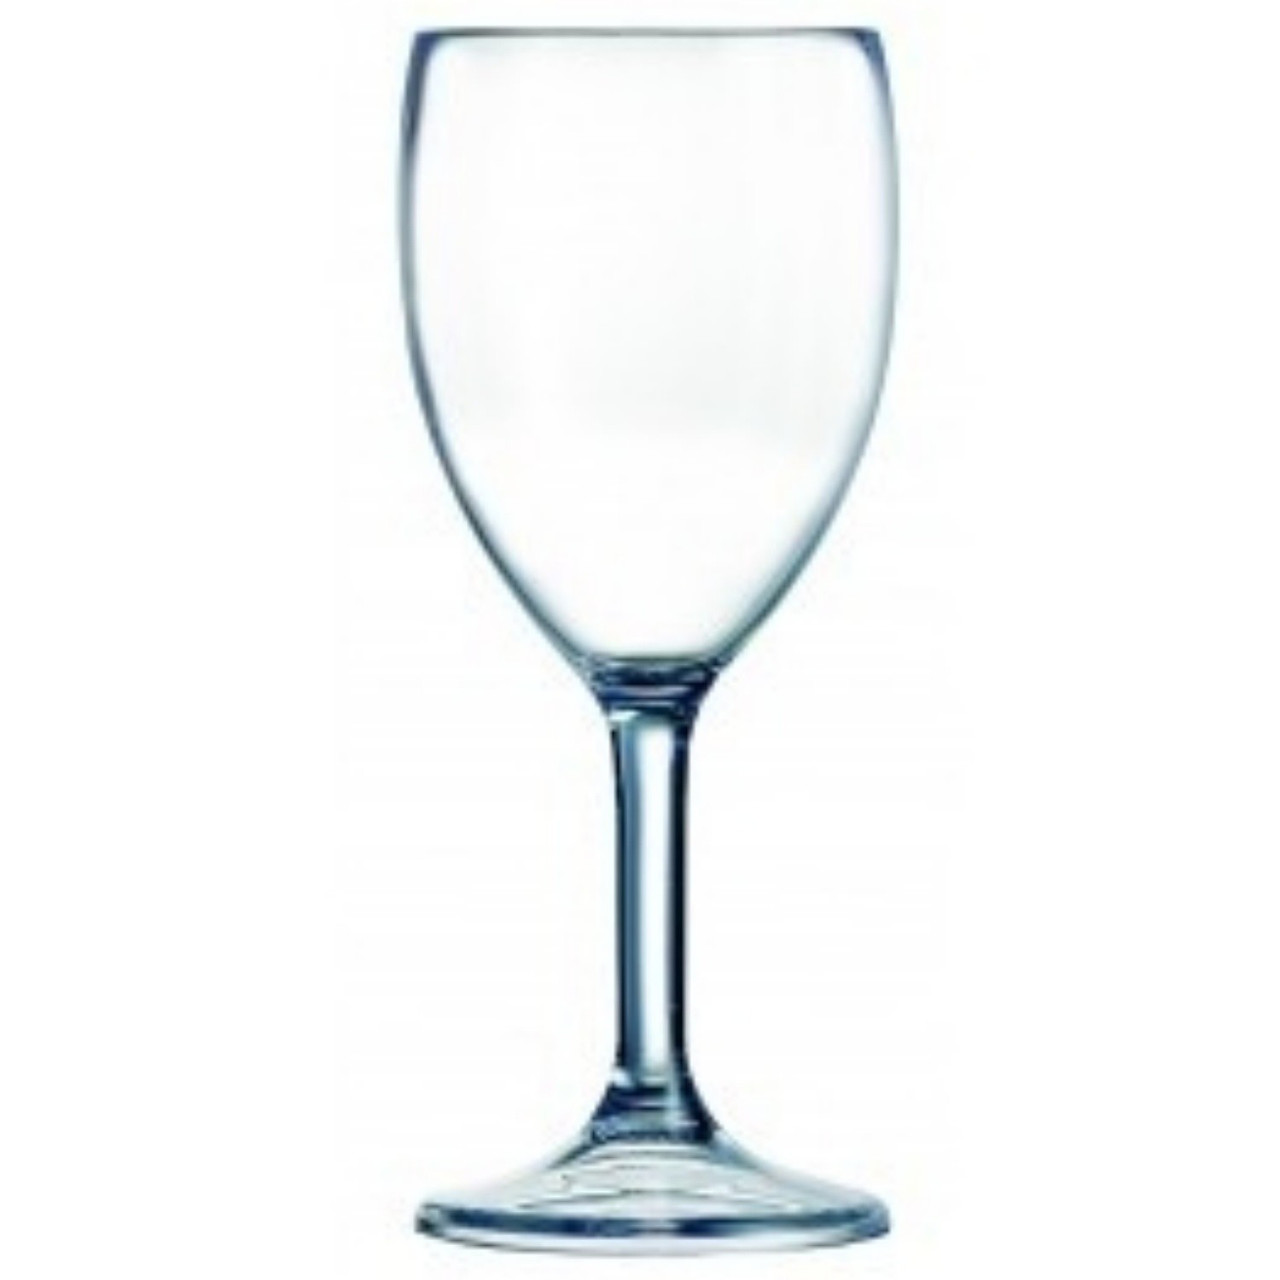 Небьющийся бокал для вина Arcoroc OUTDOOR PERFECT 300 мл (E9305)